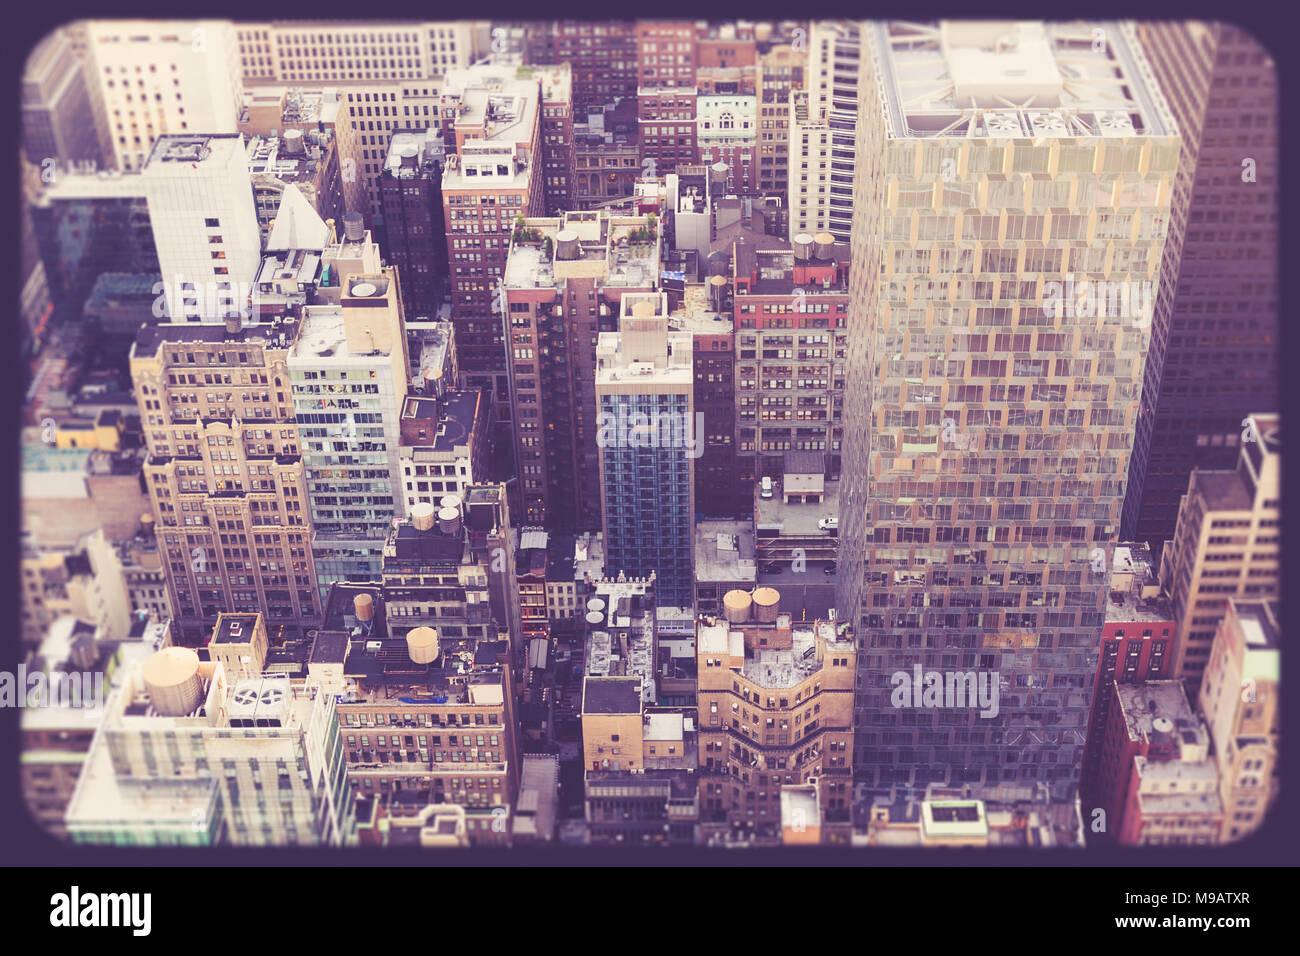 Vintage New York City Picture Imágenes De Stock & Vintage New York ...